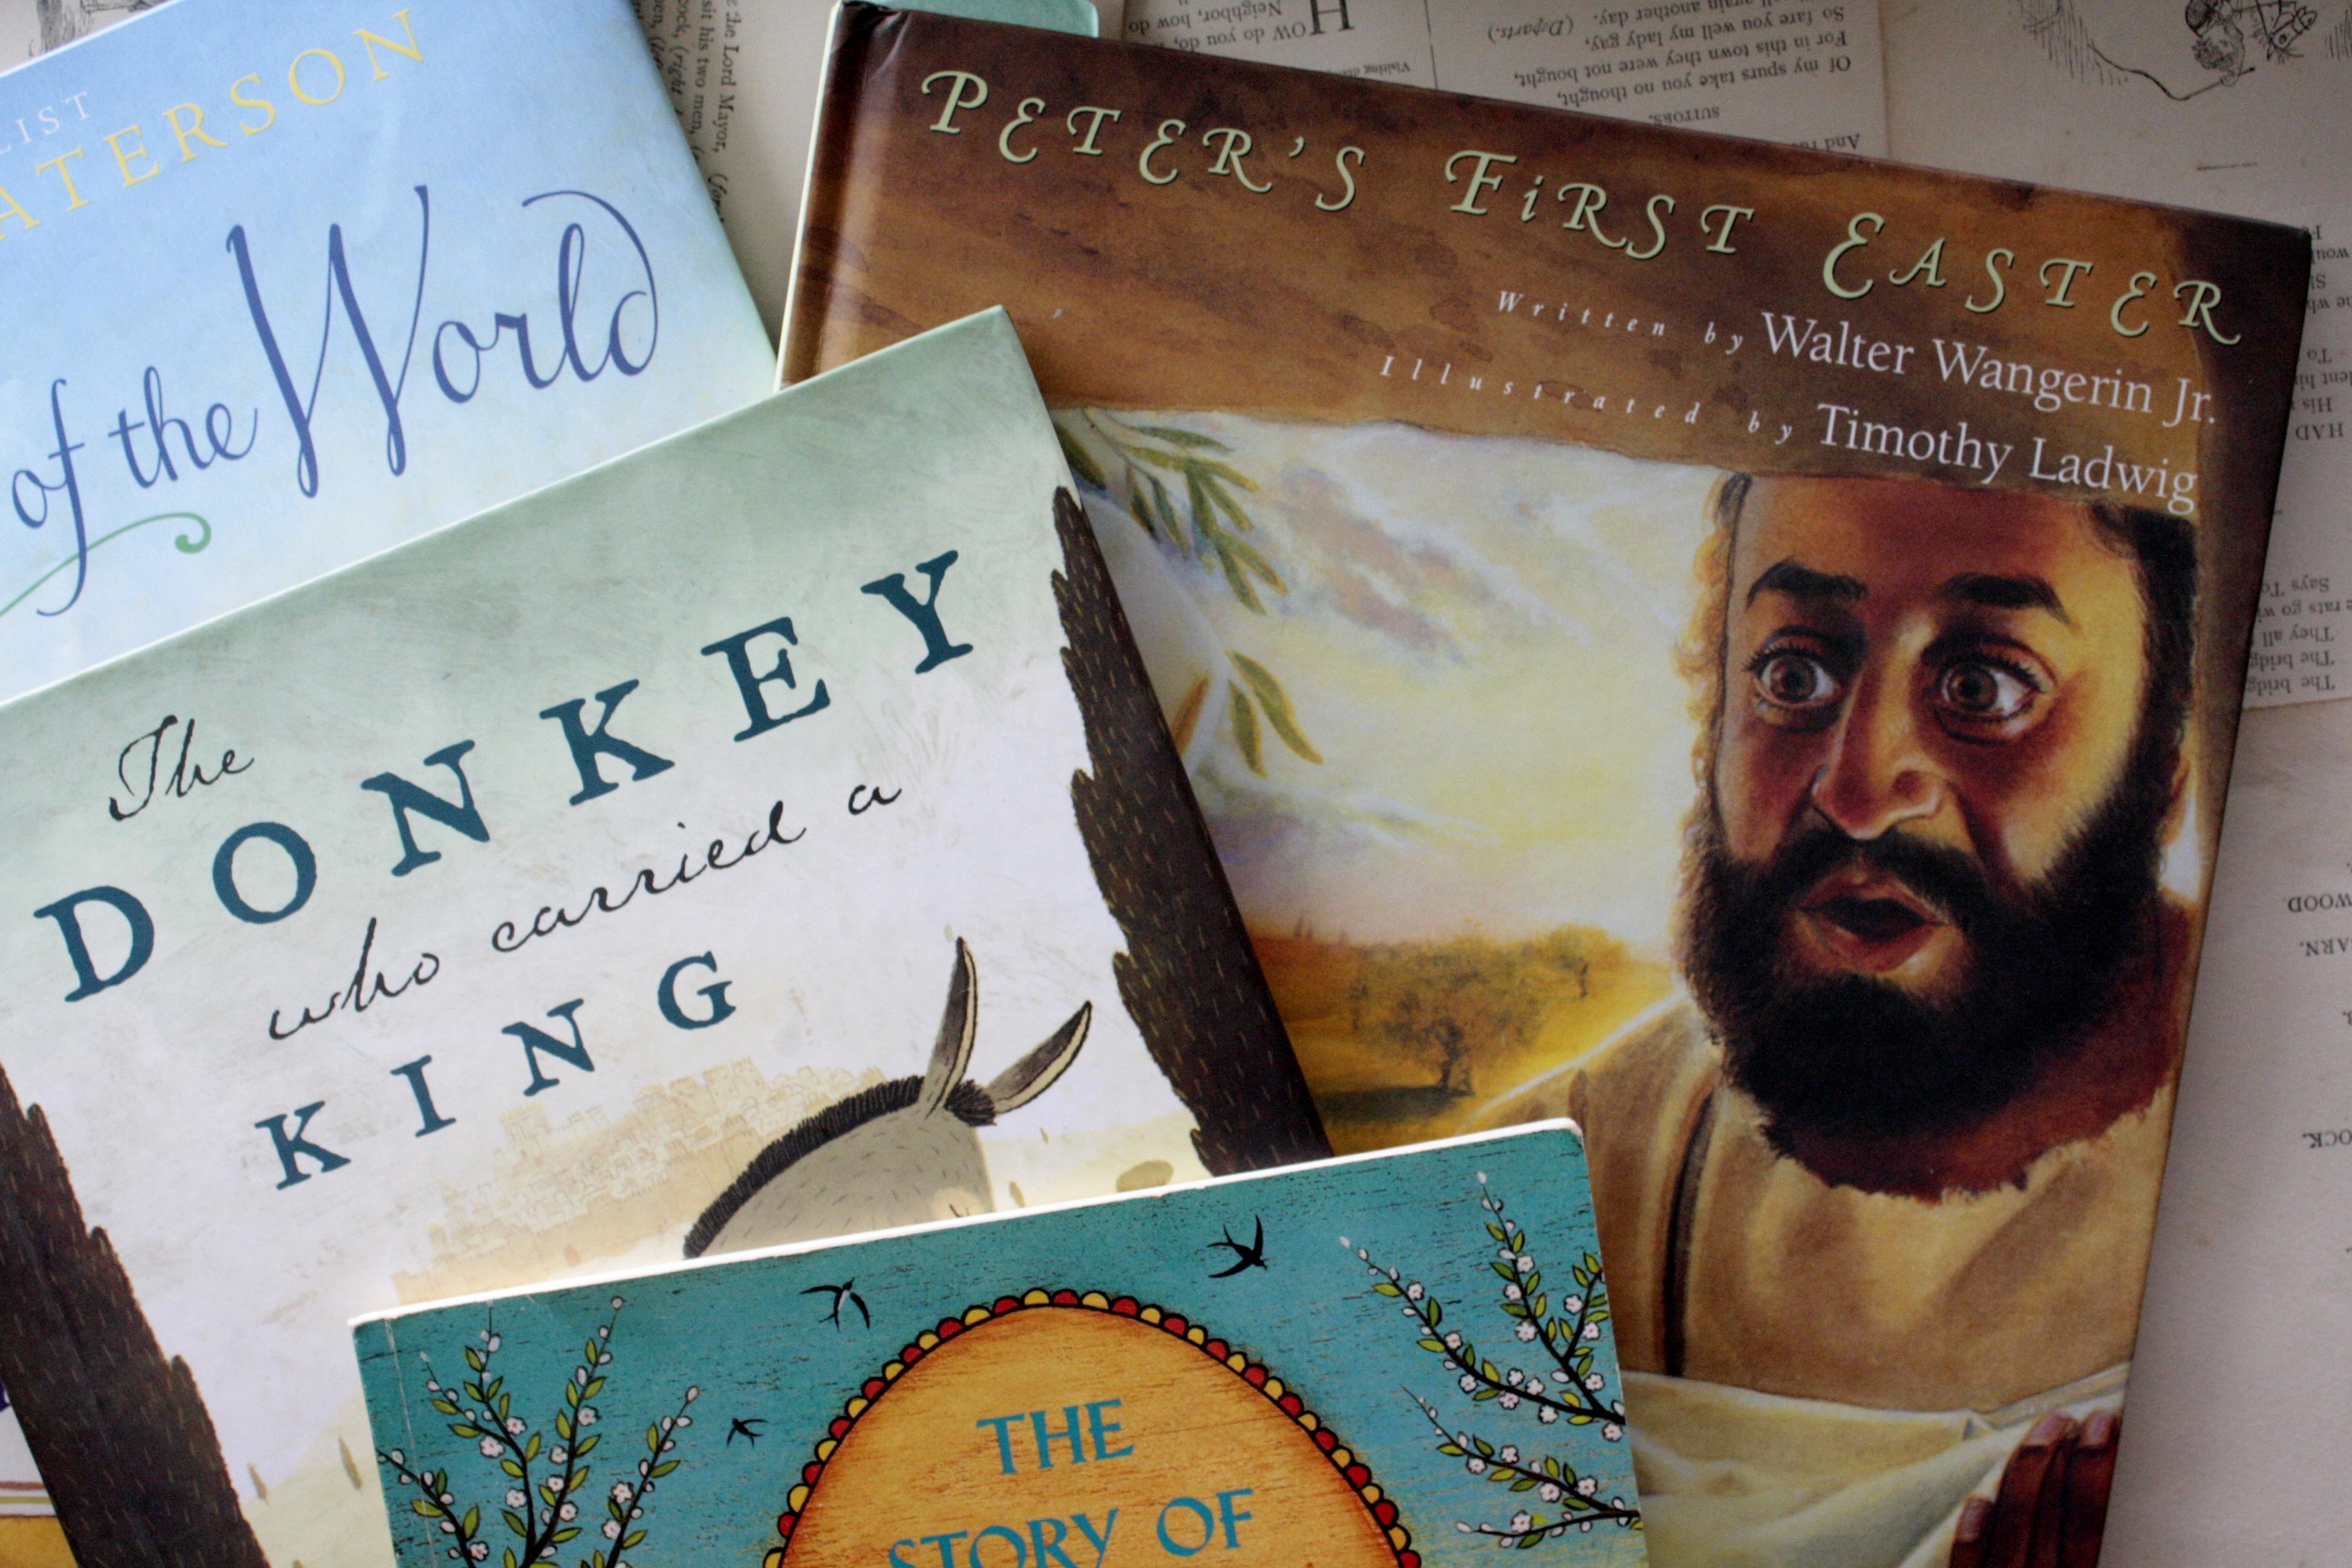 2 | Peter's First Easter, by Walter Wangerin, Jr.